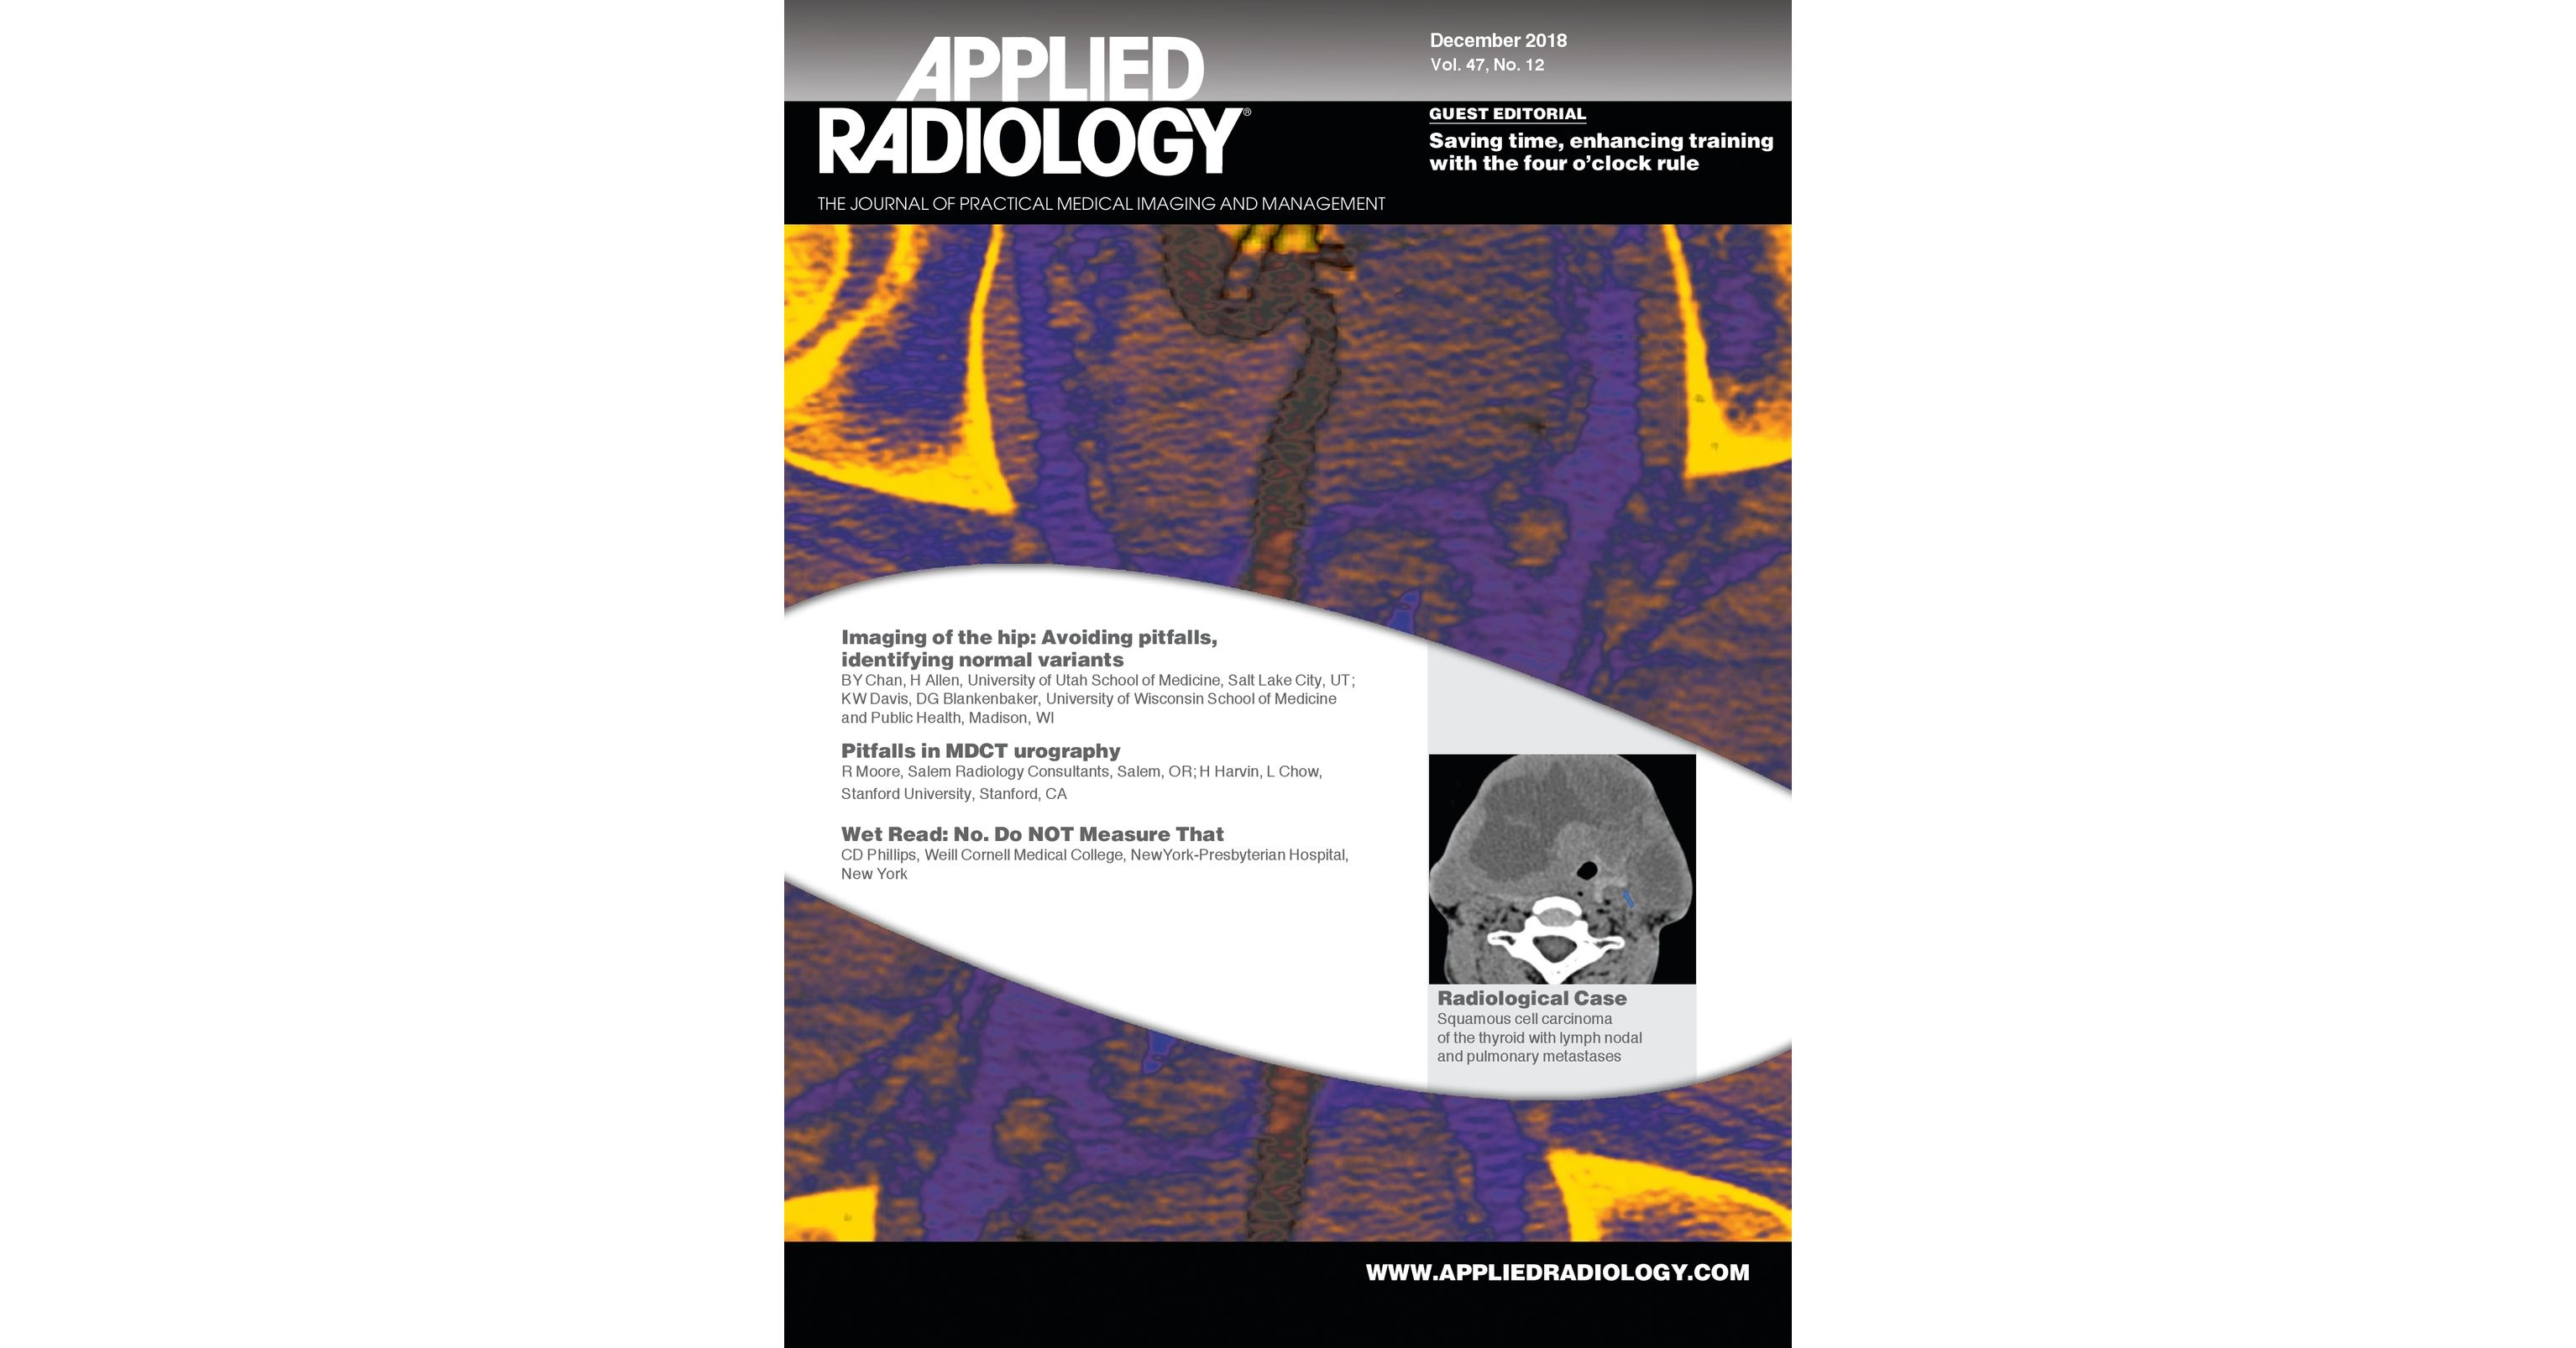 December 2018 Applied Radiology